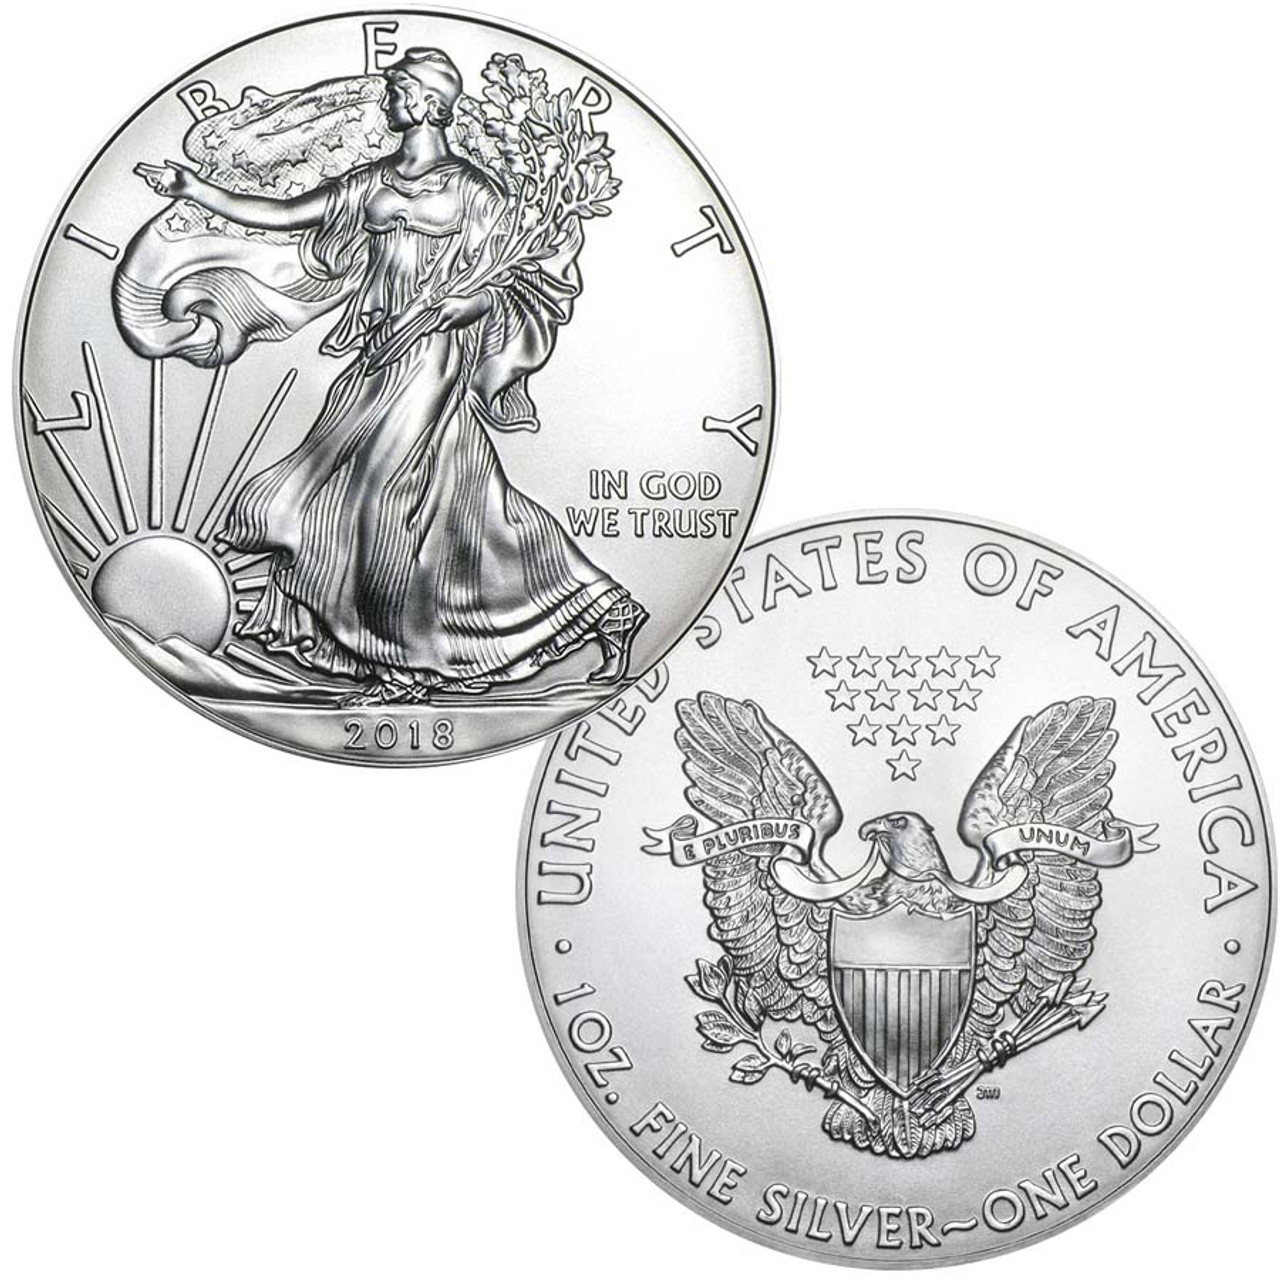 2018 Silver Eagle Brilliant Uncirculated Image 1